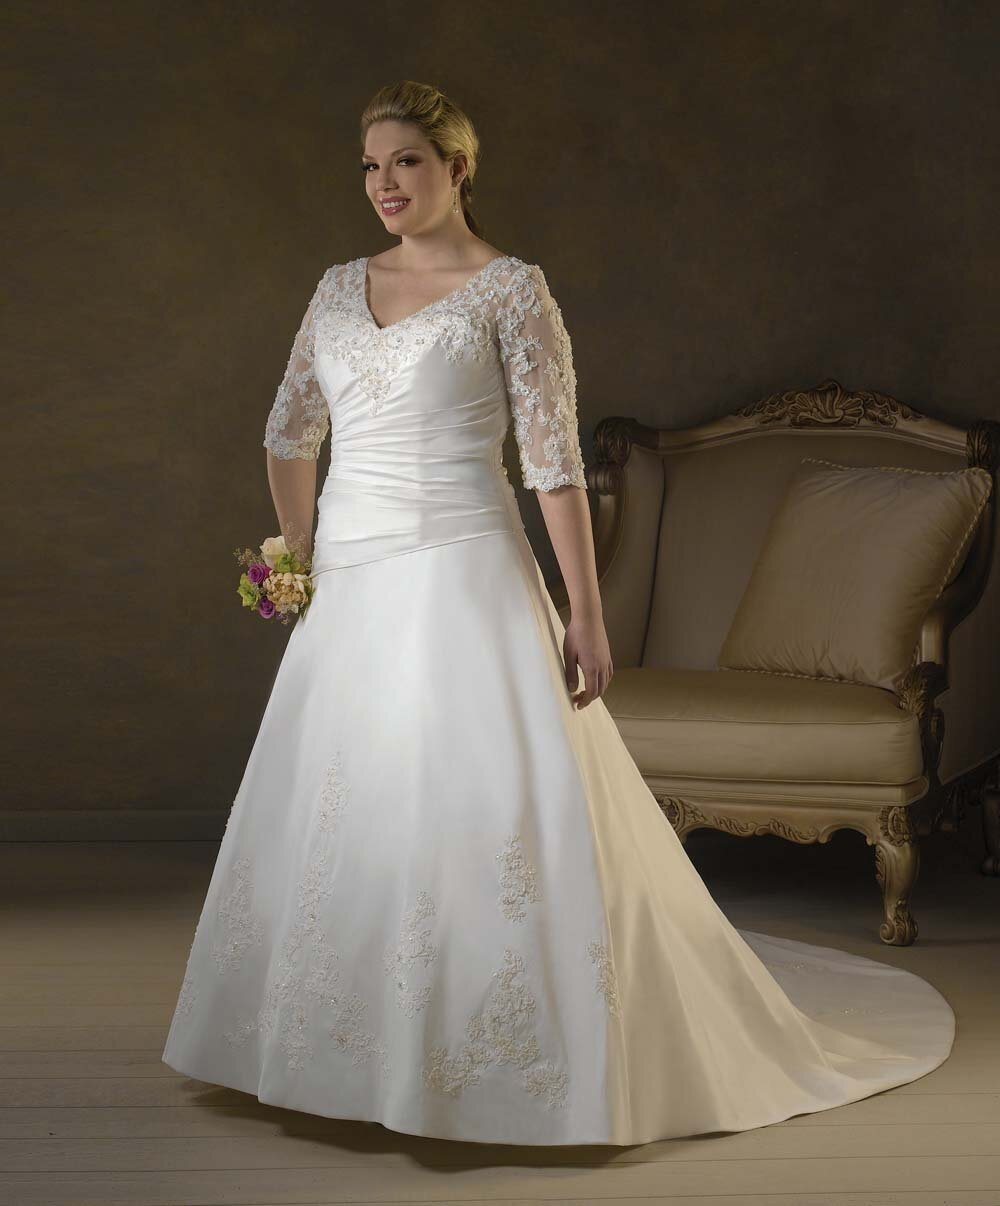 Plus size retro wedding dresses pictures ideas guide to for Retro wedding dresses plus size